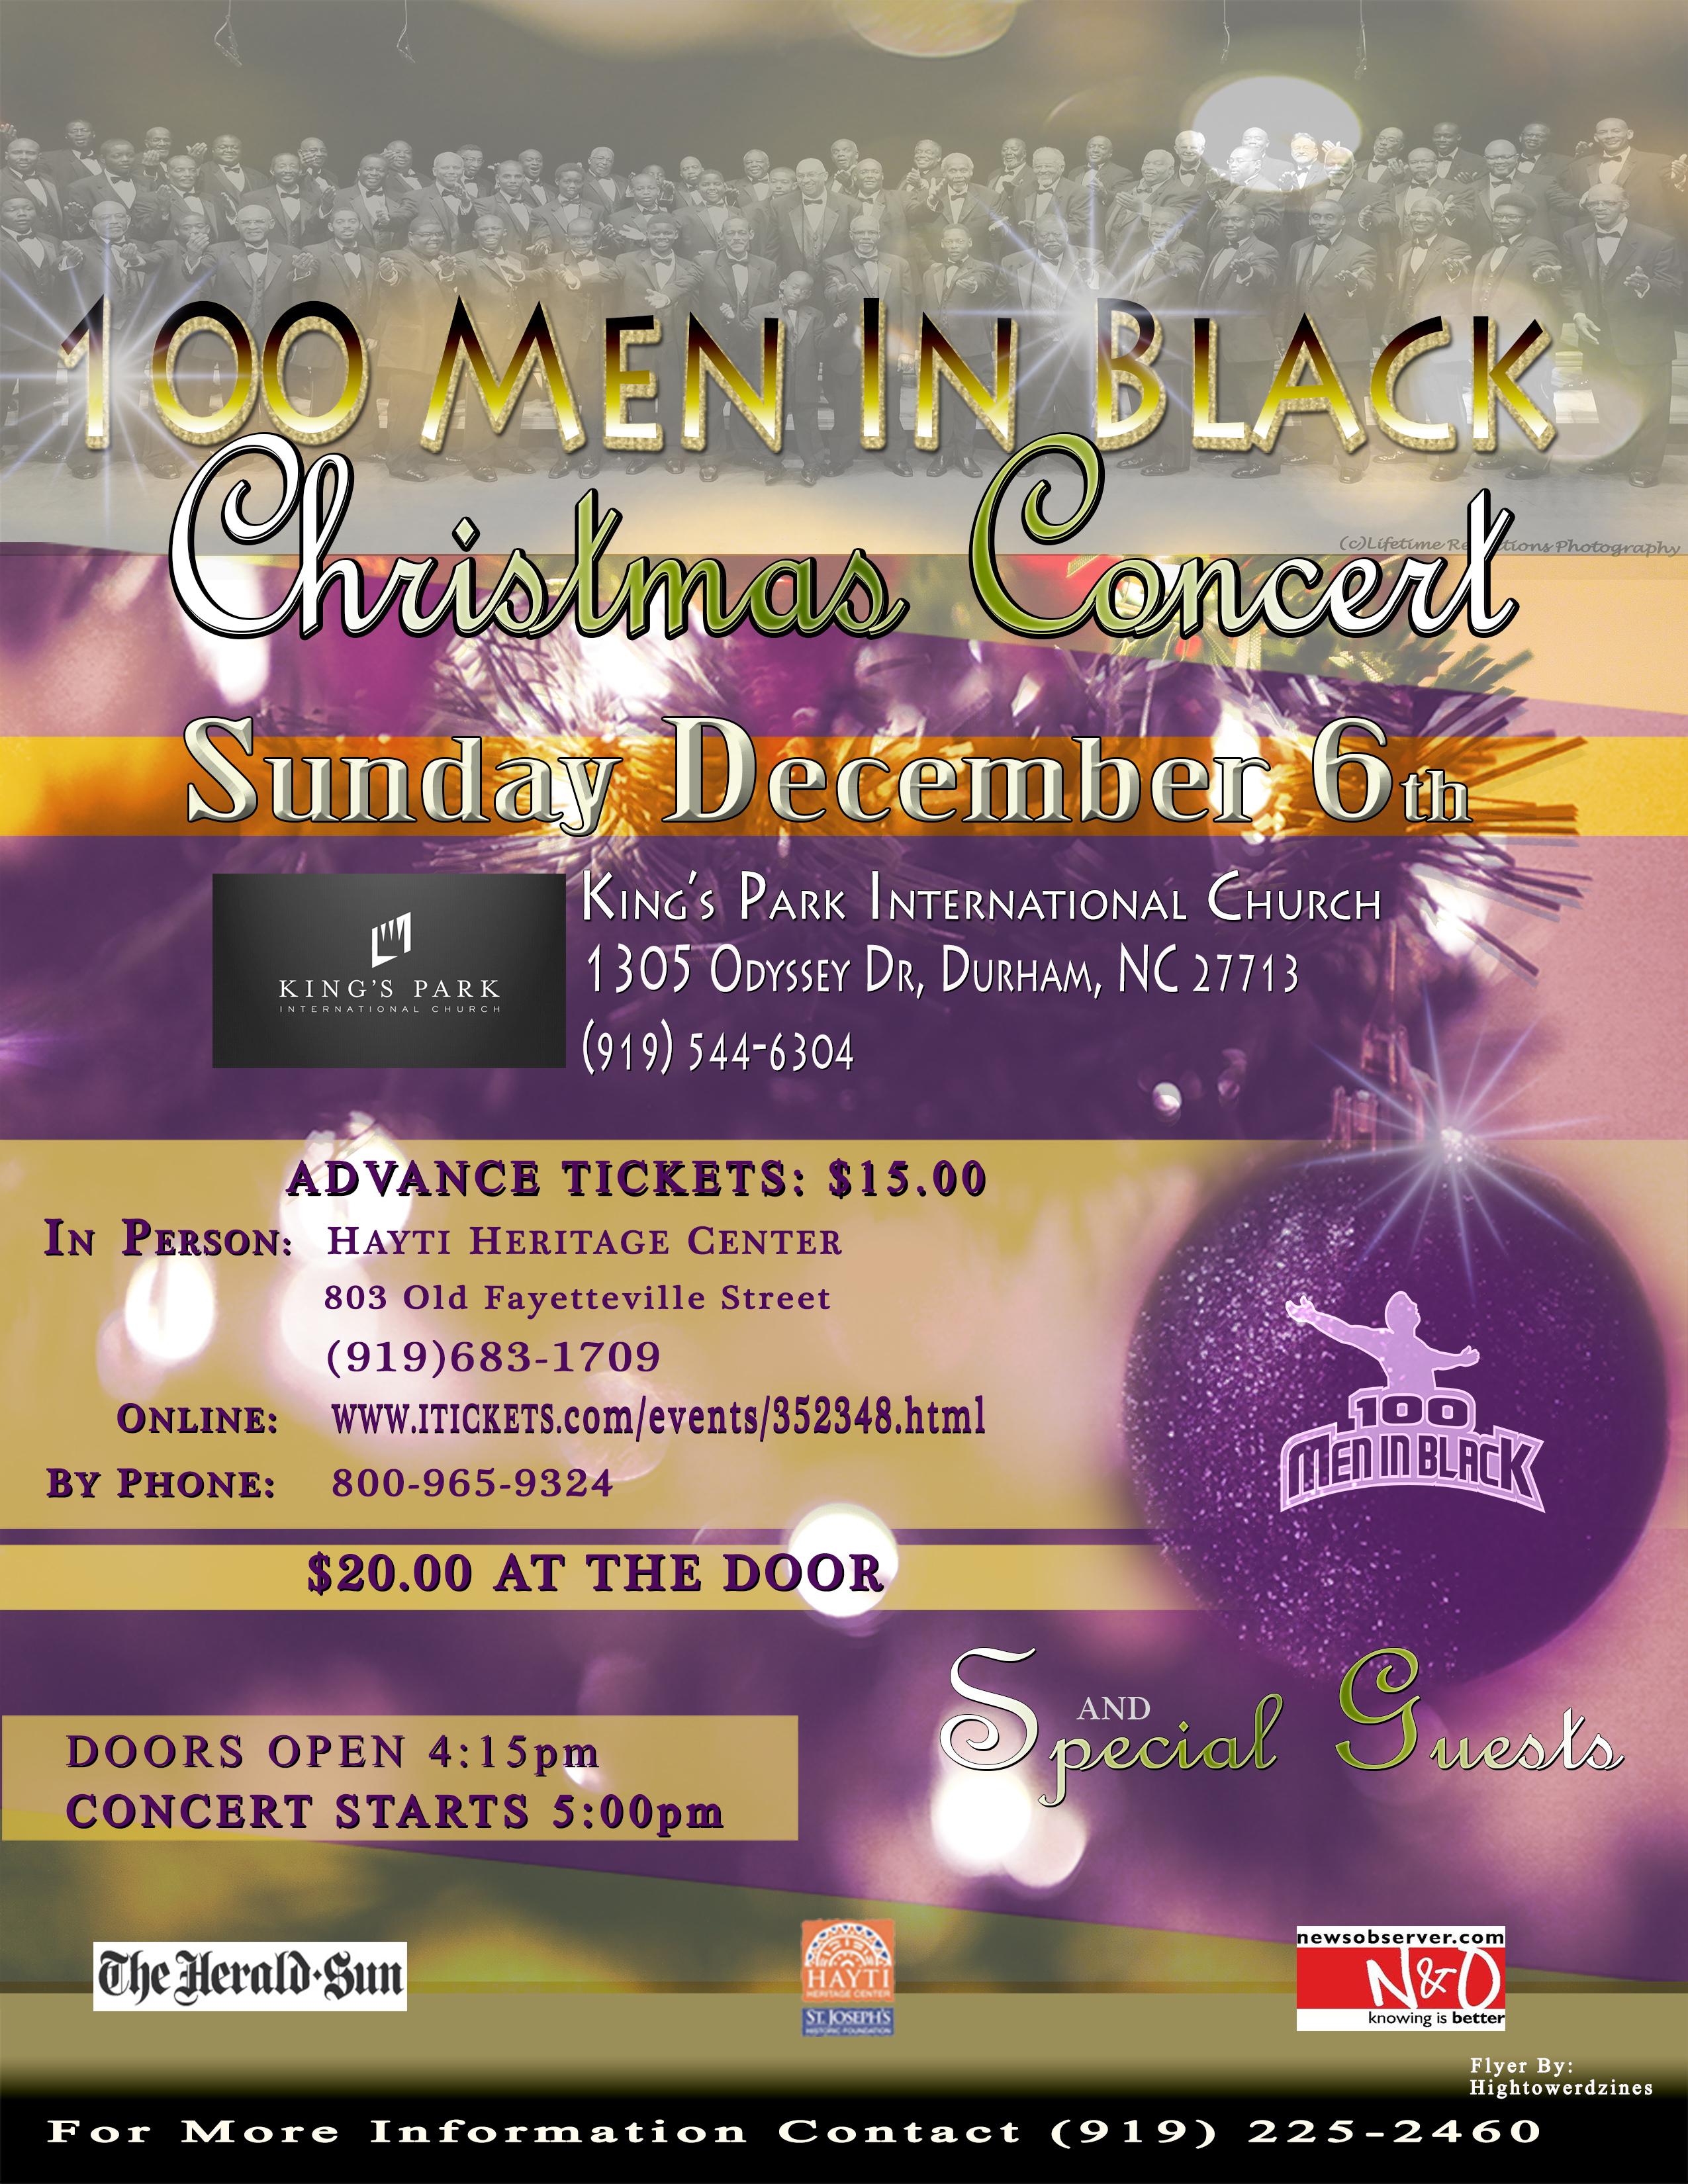 December 6th Christmas Concert Flyer 100 Men In Black